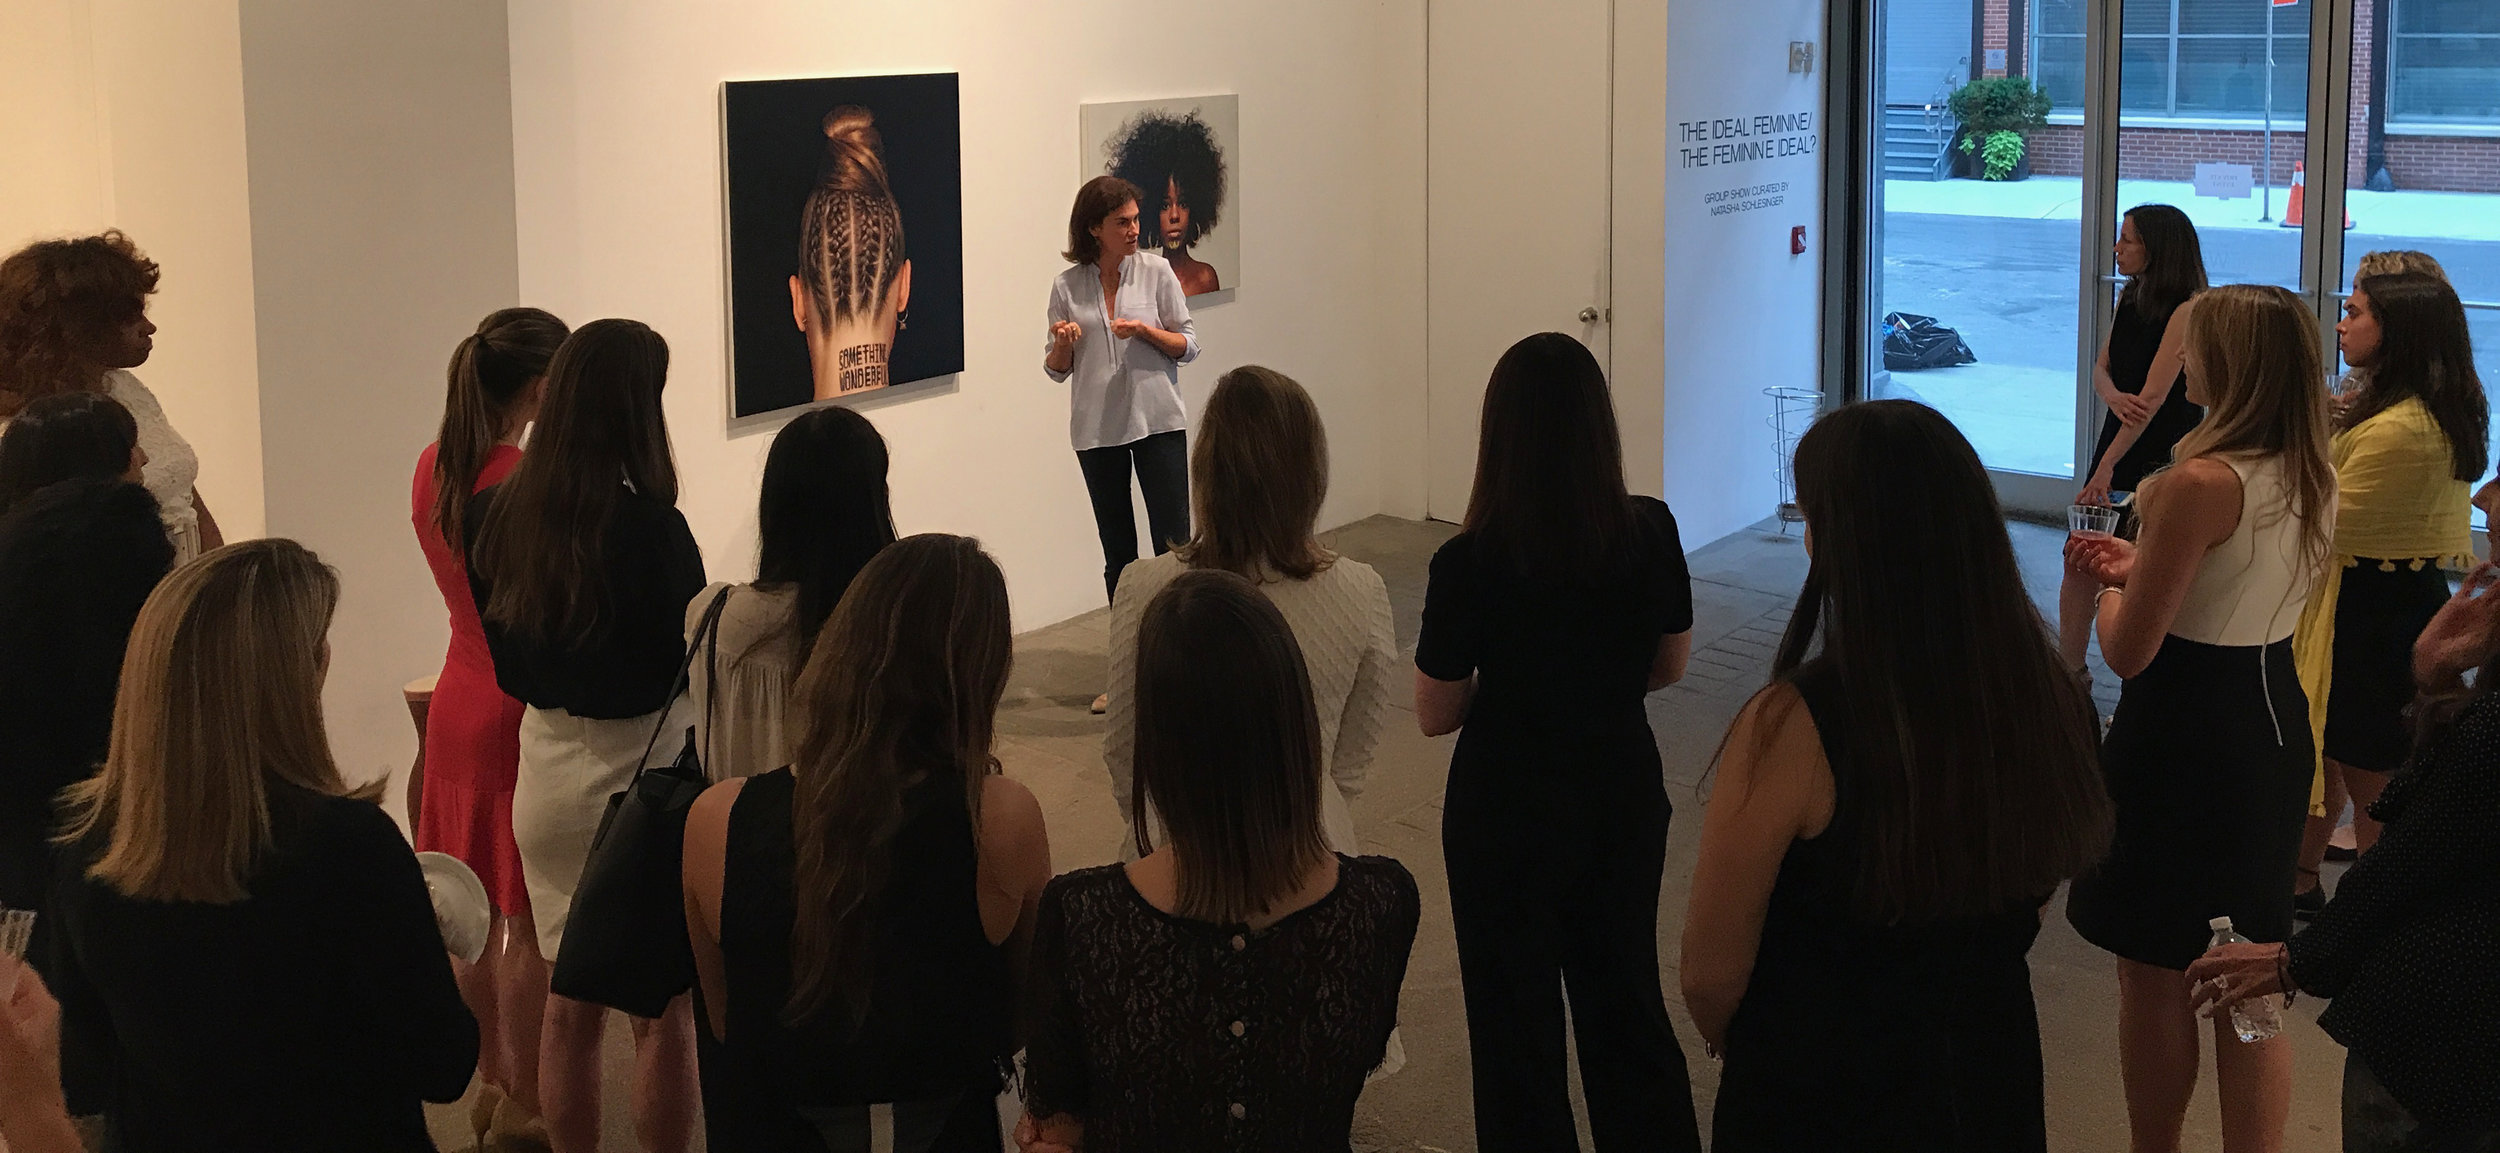 Natasha Schlesinger speaking at Winston Wachter Fine Art